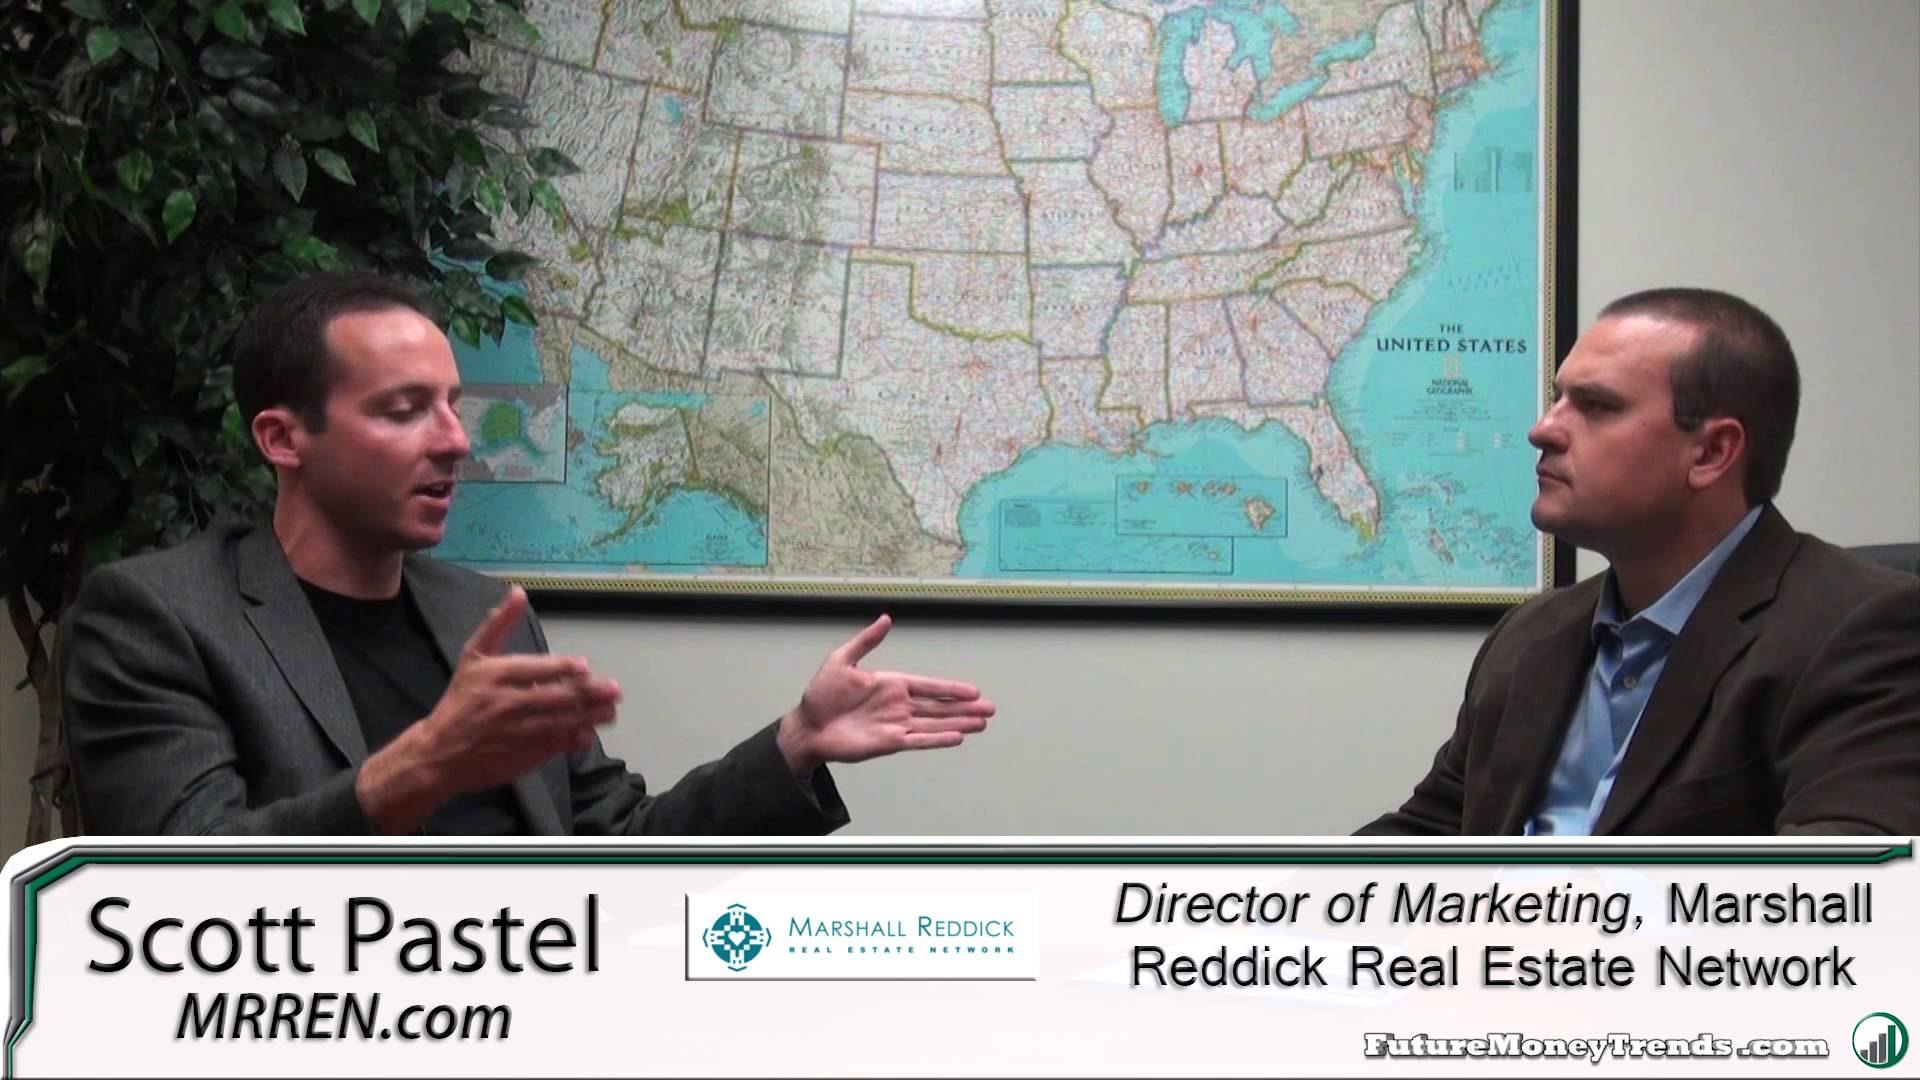 Marshall Reddick Real Estate Investor Update – Scott Pastel Interview